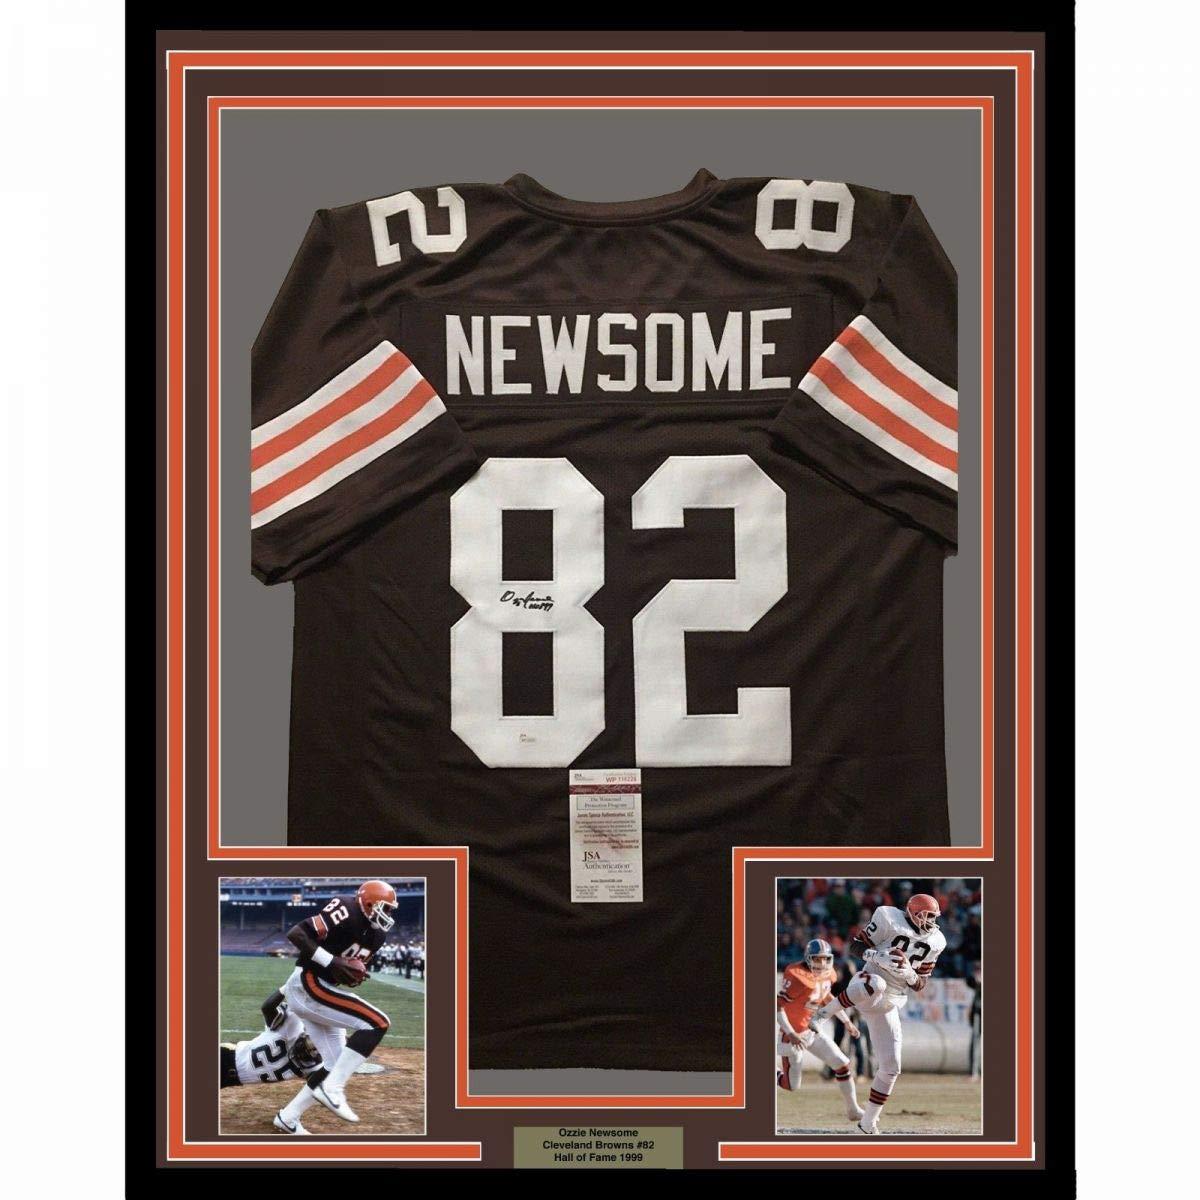 dd43c7186 Framed Autographed Signed Ozzie Newsome HOF 99 33x42 Cleveland Brown  Football Jersey JSA COA